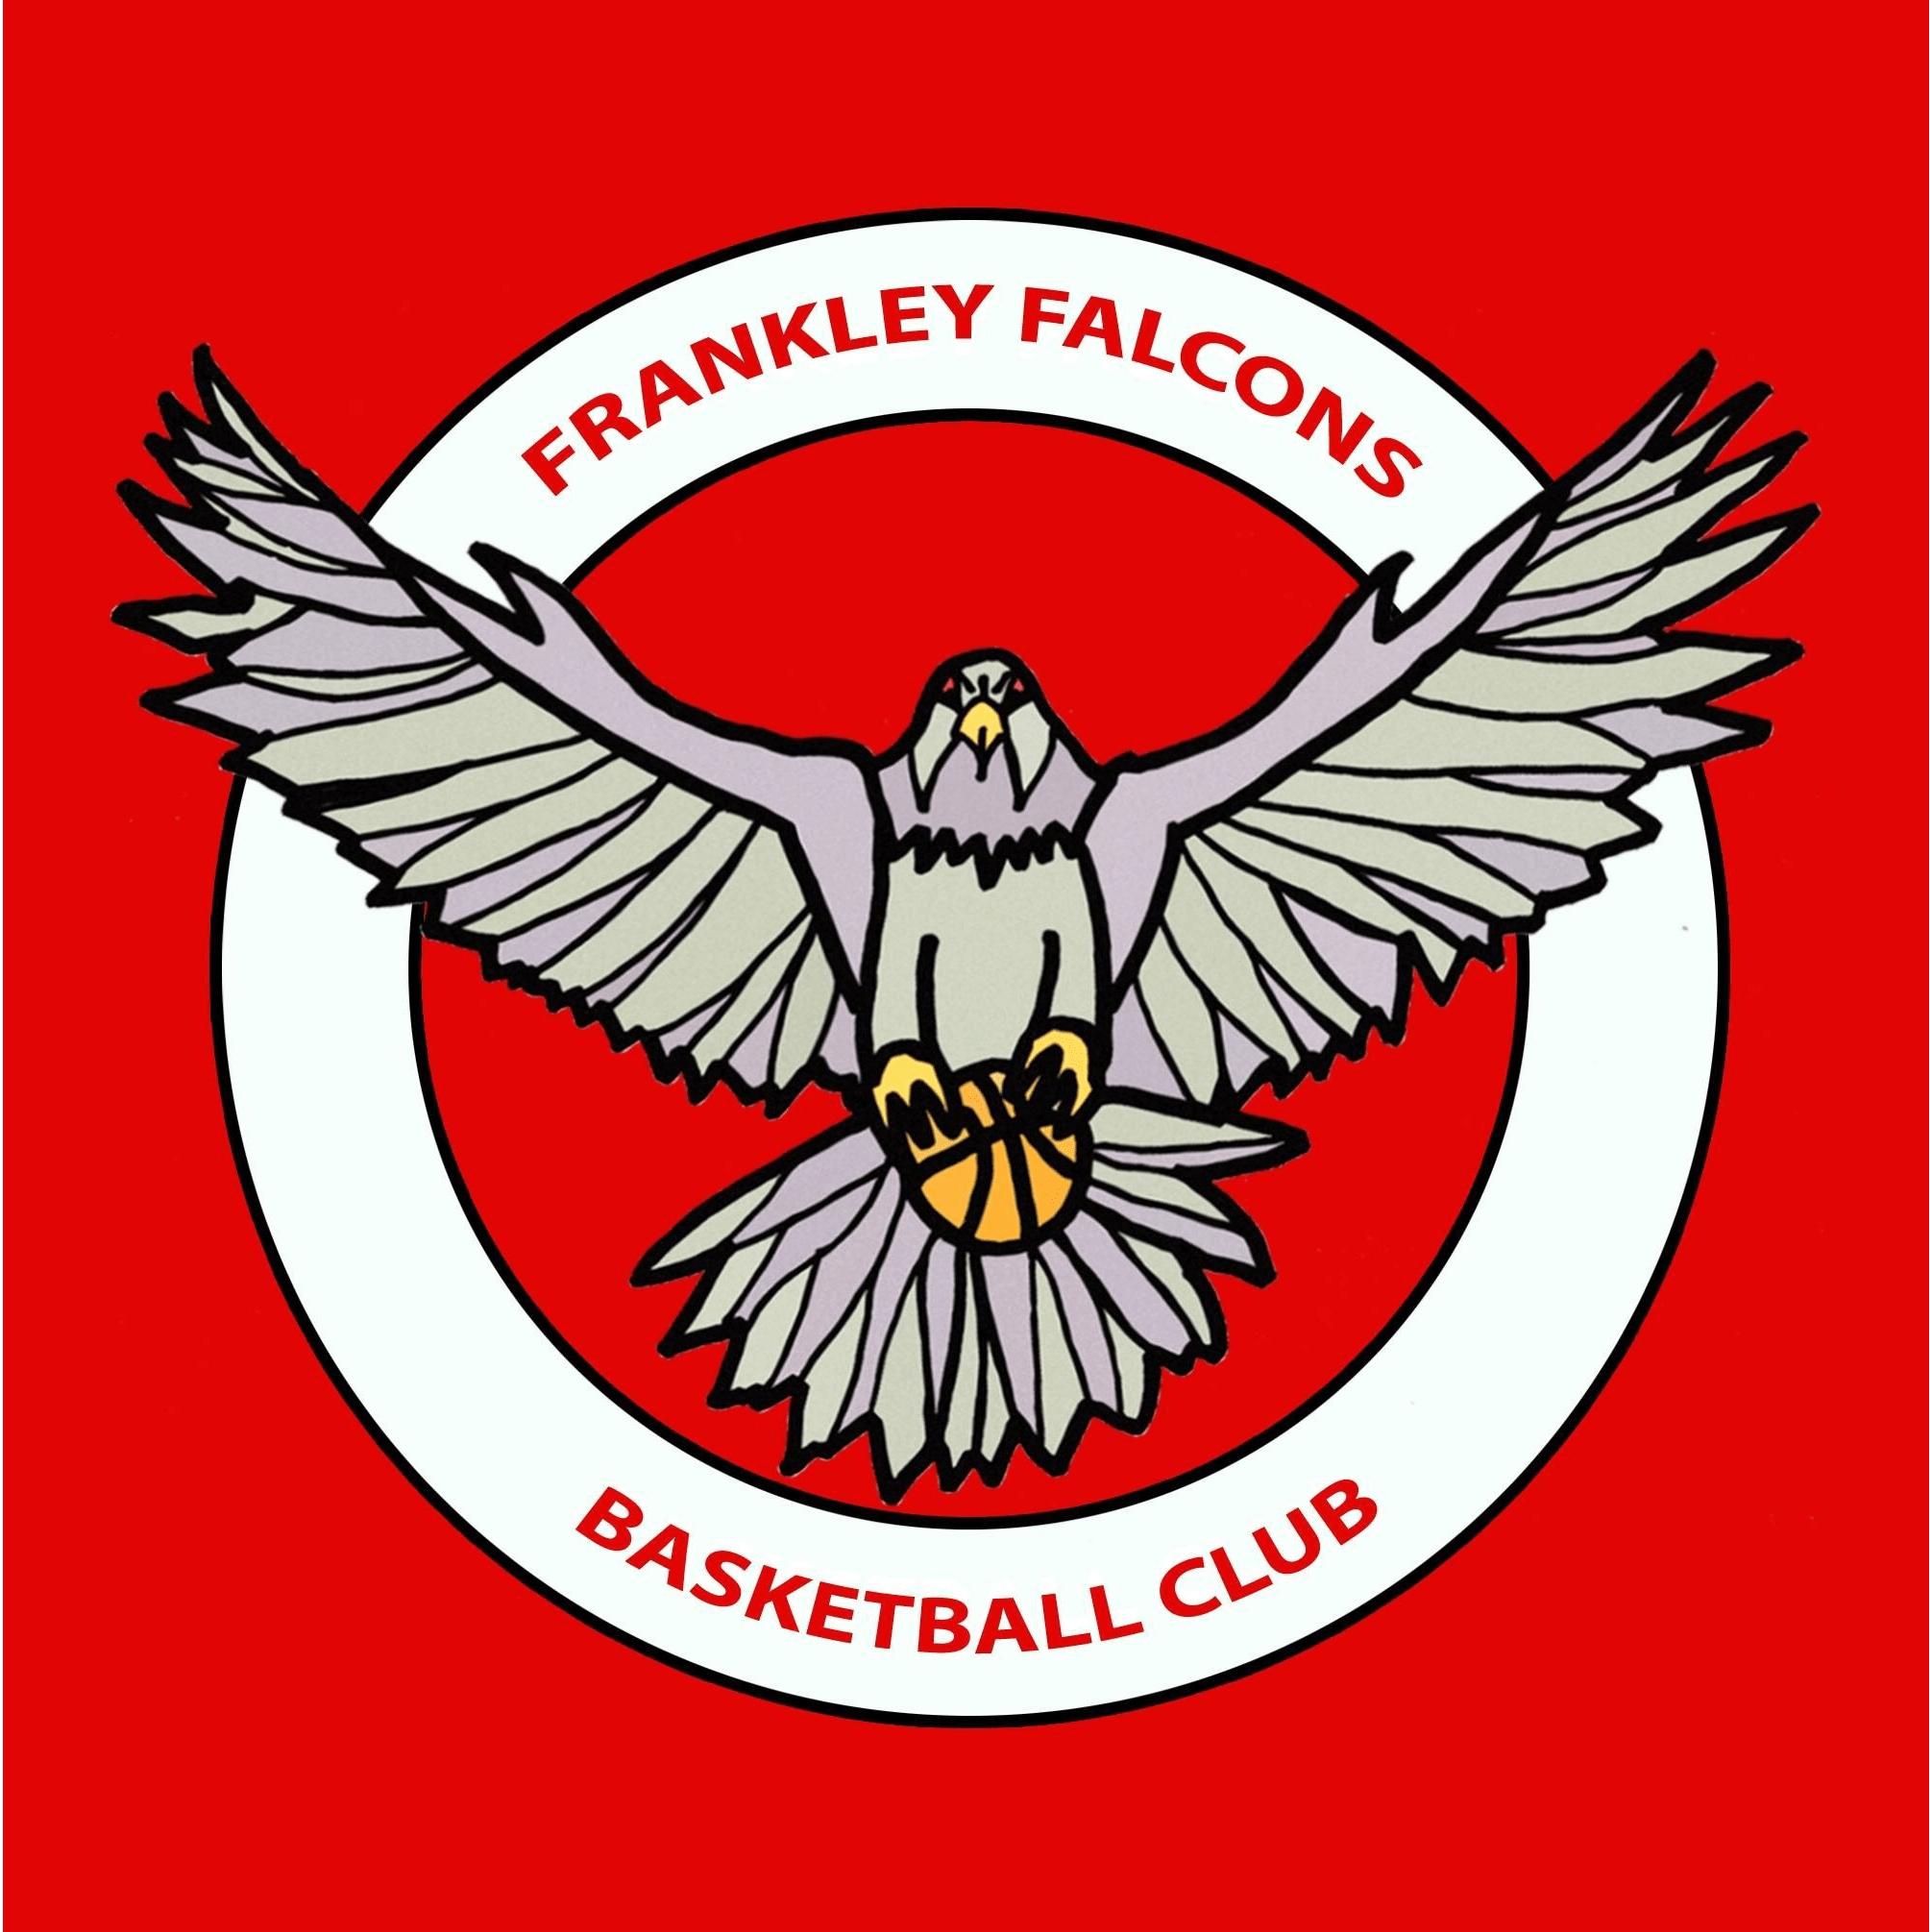 Frankley Falcons Basketball Club